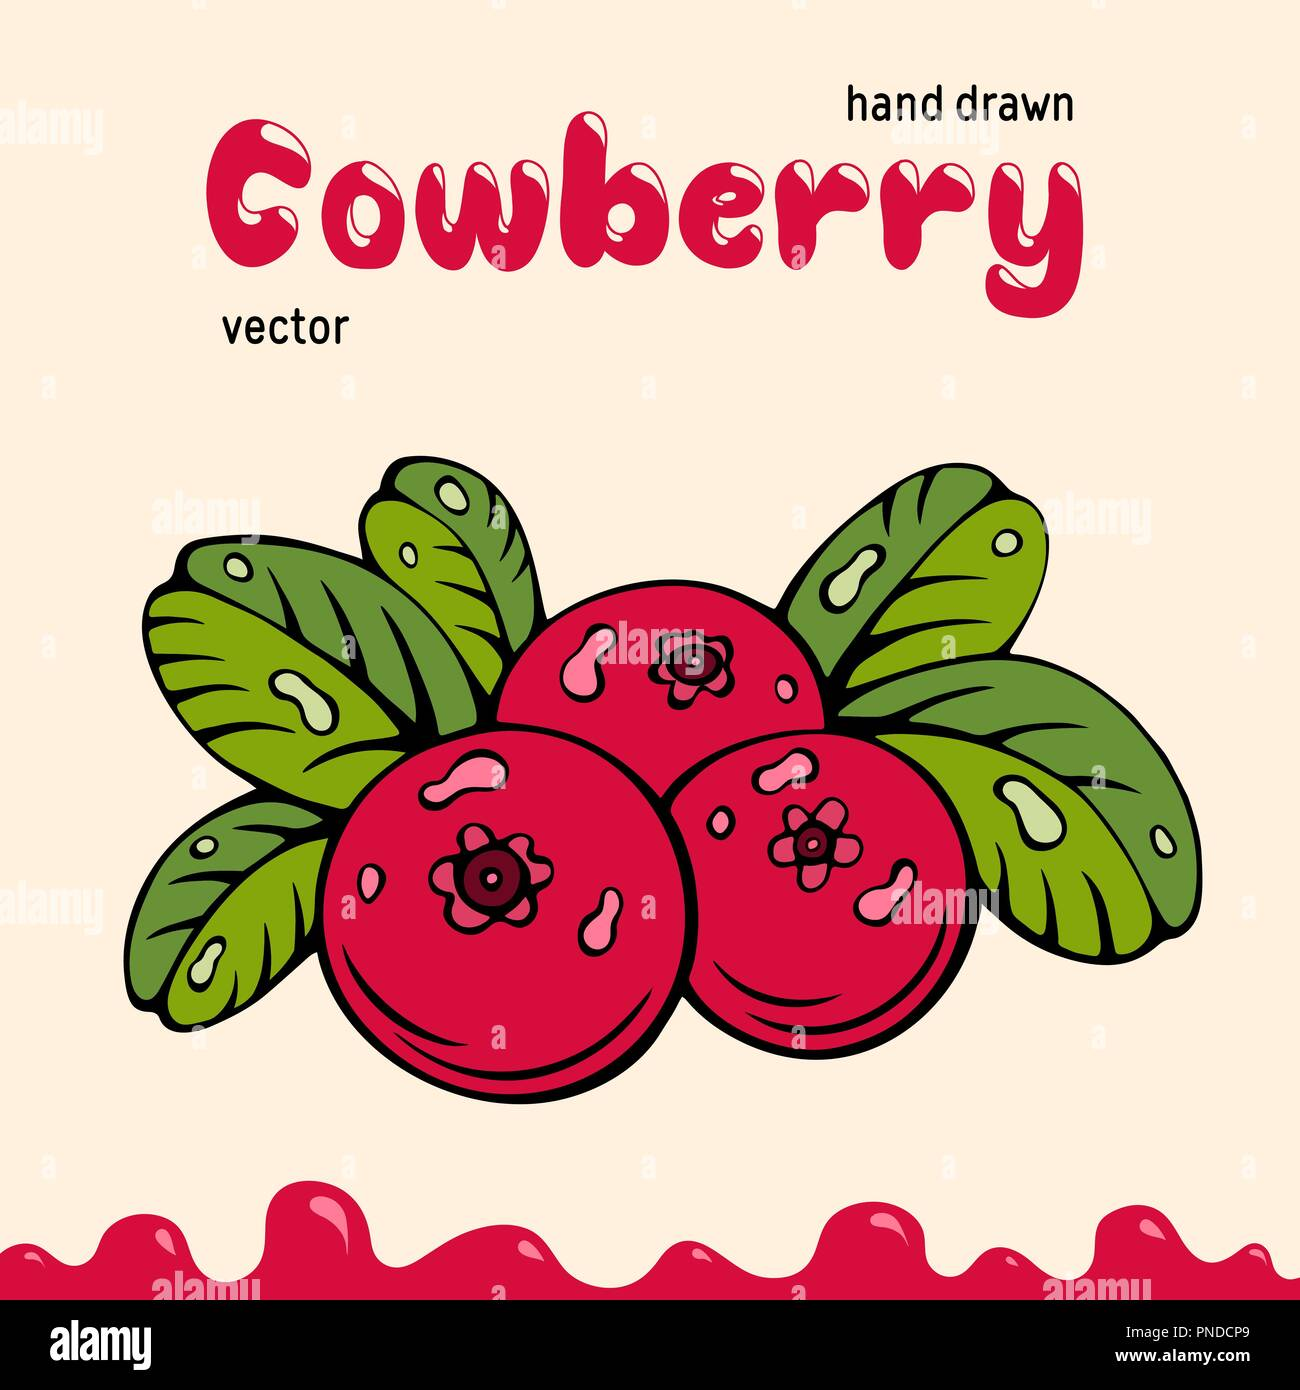 Cowberry vector illustration, berries images. Doodle cowberry vector illustration in red and green color. Cowberry berries images for menu, package de - Stock Vector